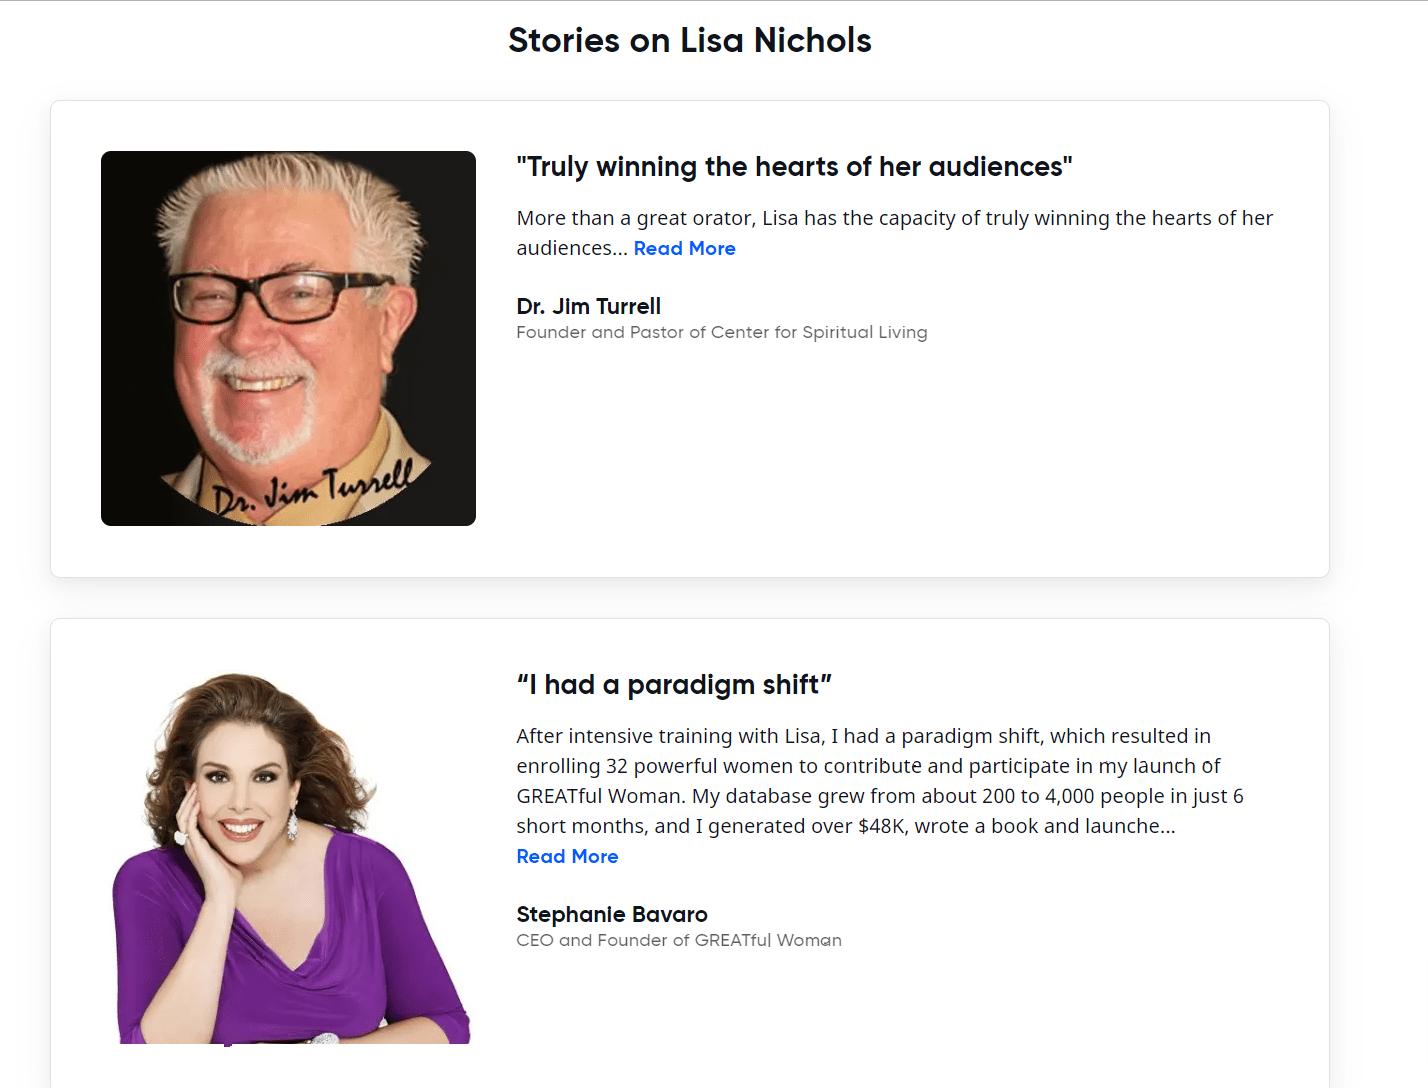 Stories on Speak and Inspire